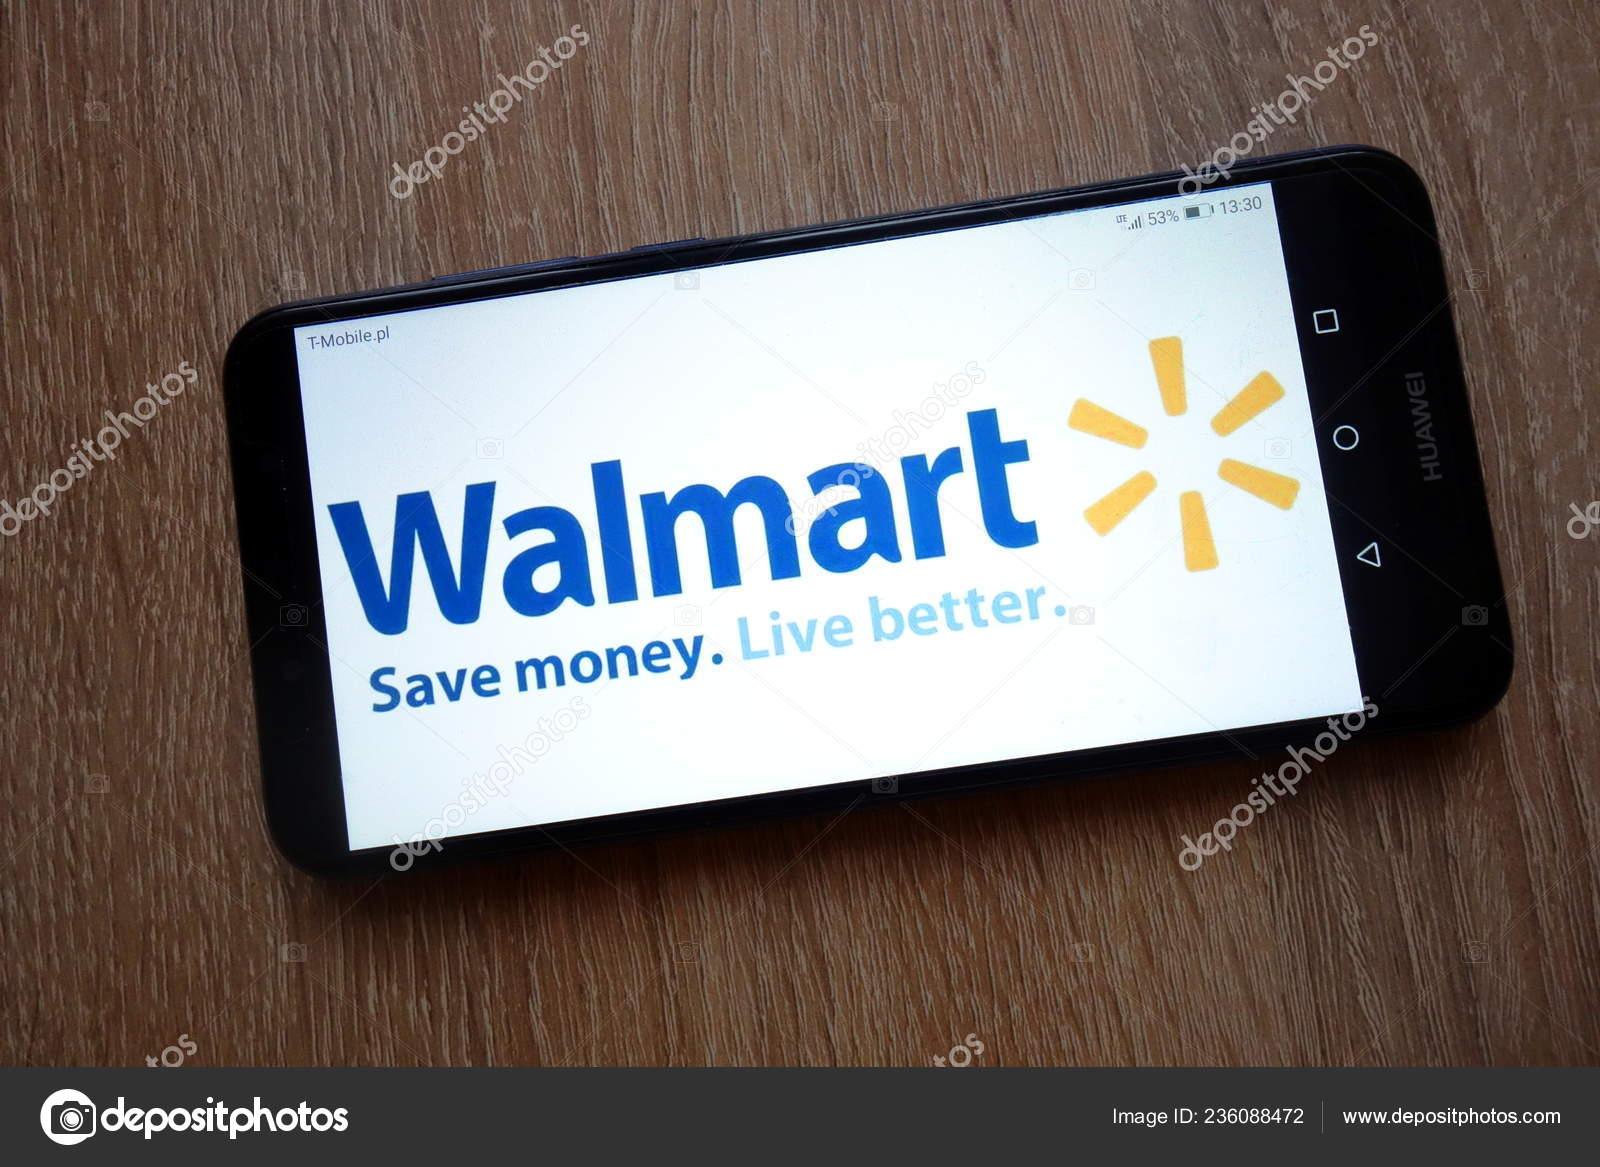 Walmart Stock Phone Number >> Konskie Poland January 2019 Walmart Logo Displayed Smartphone